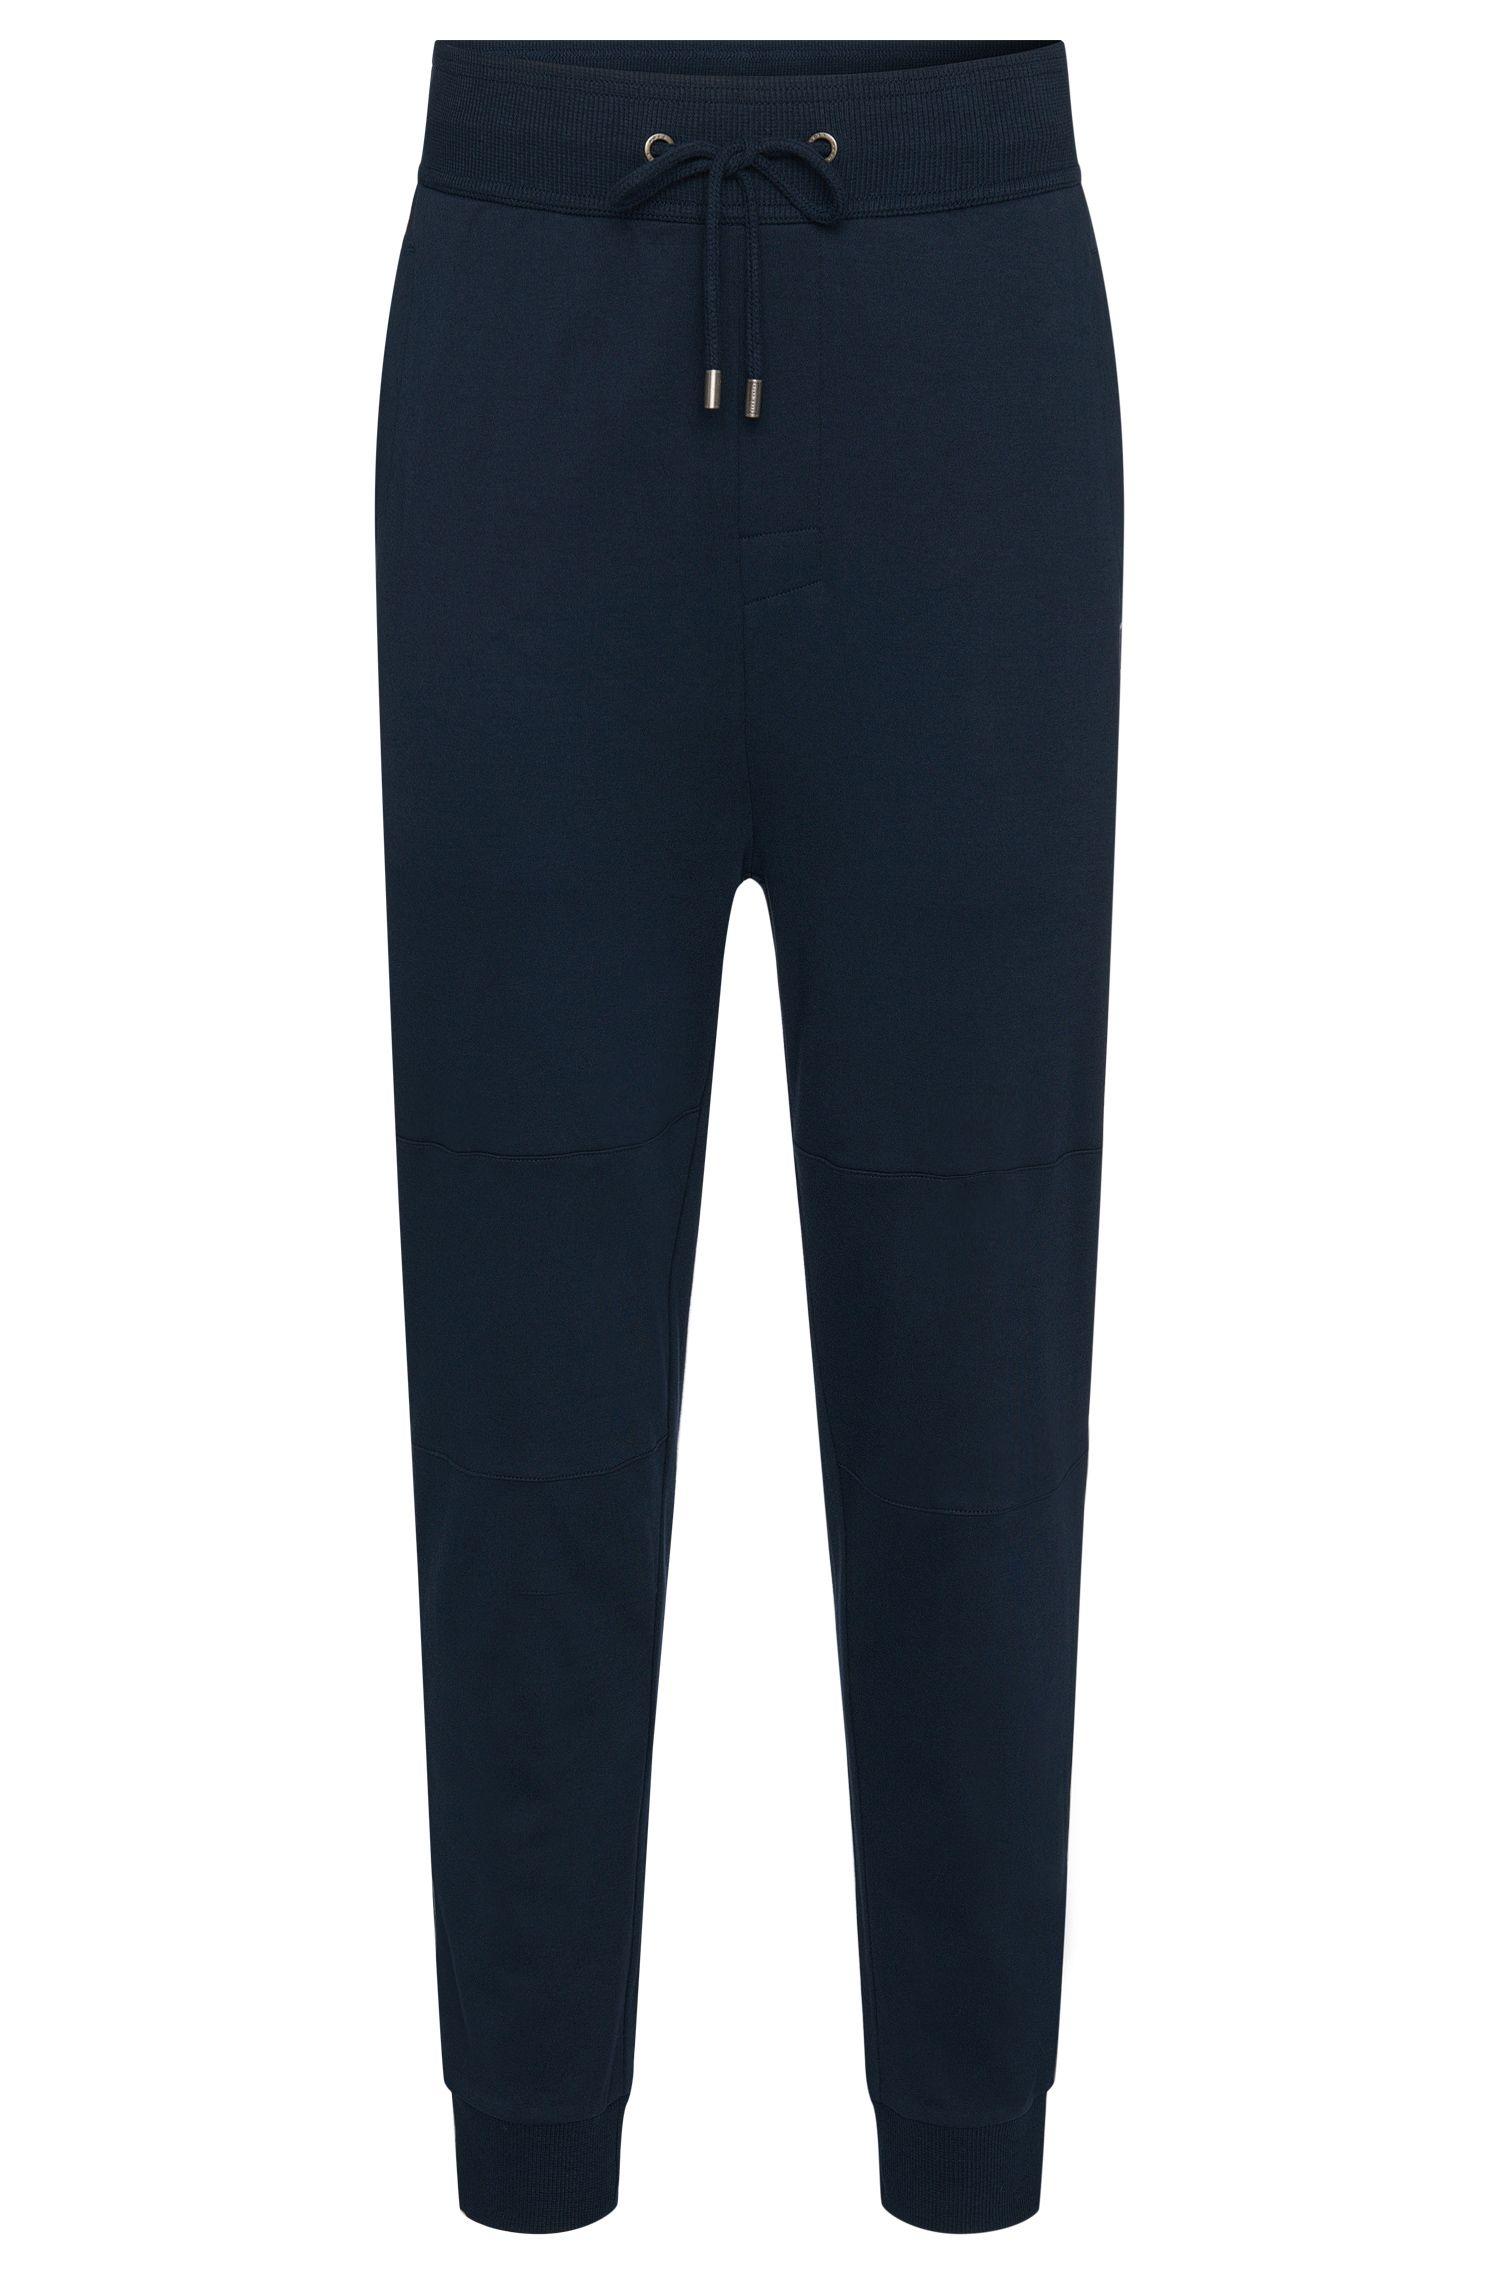 Pantalon de jogging uni en coton: «Long Pant Cuffs»